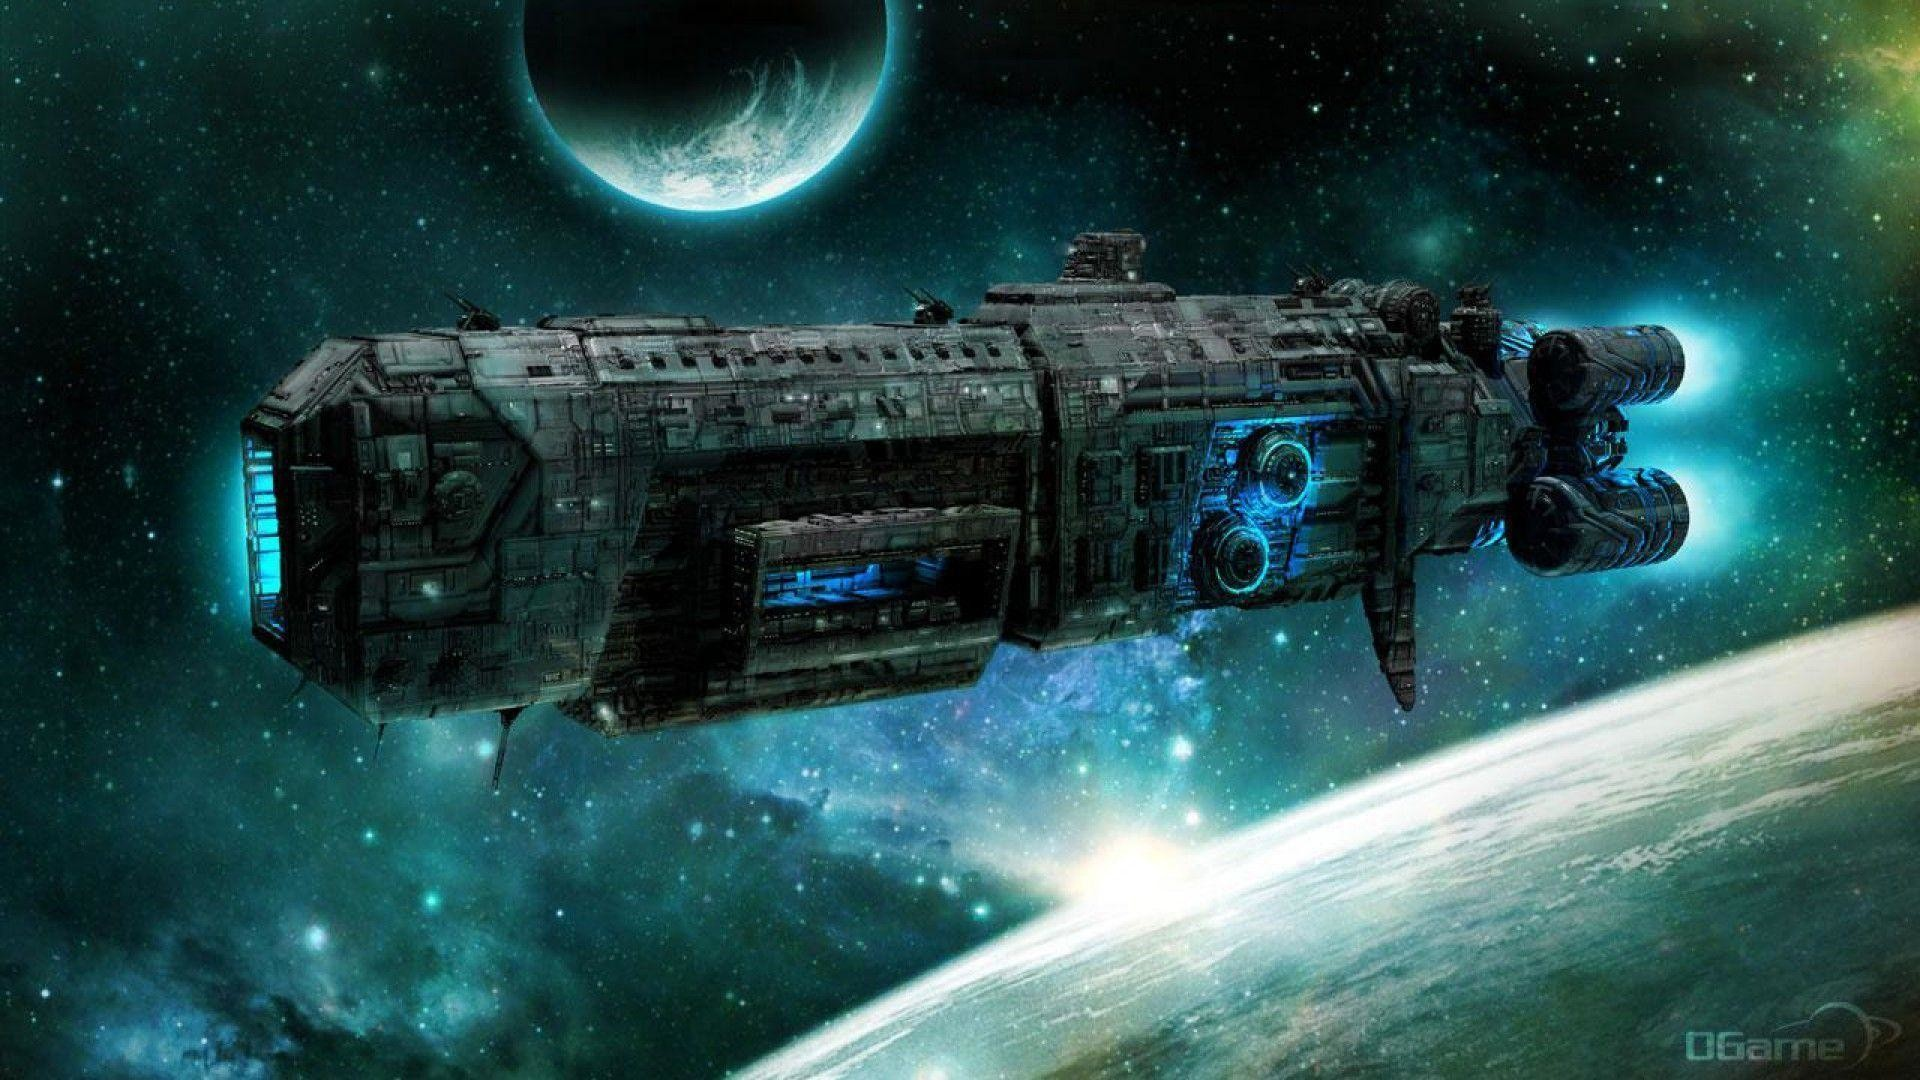 alien spaceship wallpaper 74 images